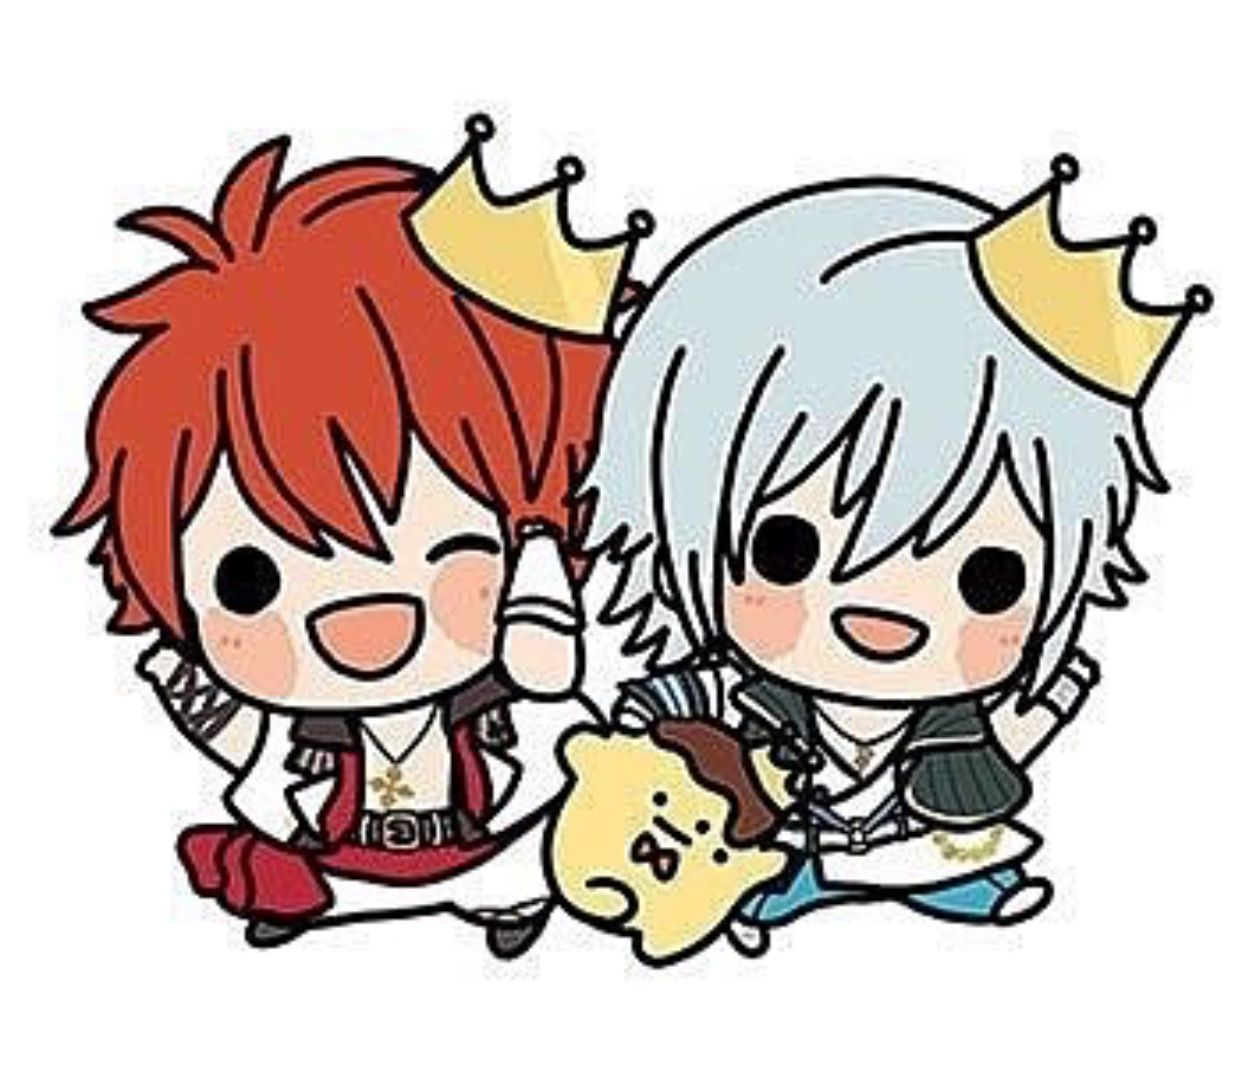 Pin by ^_^Suna on Idolish7 Anime boy, Anime, Idolmaster